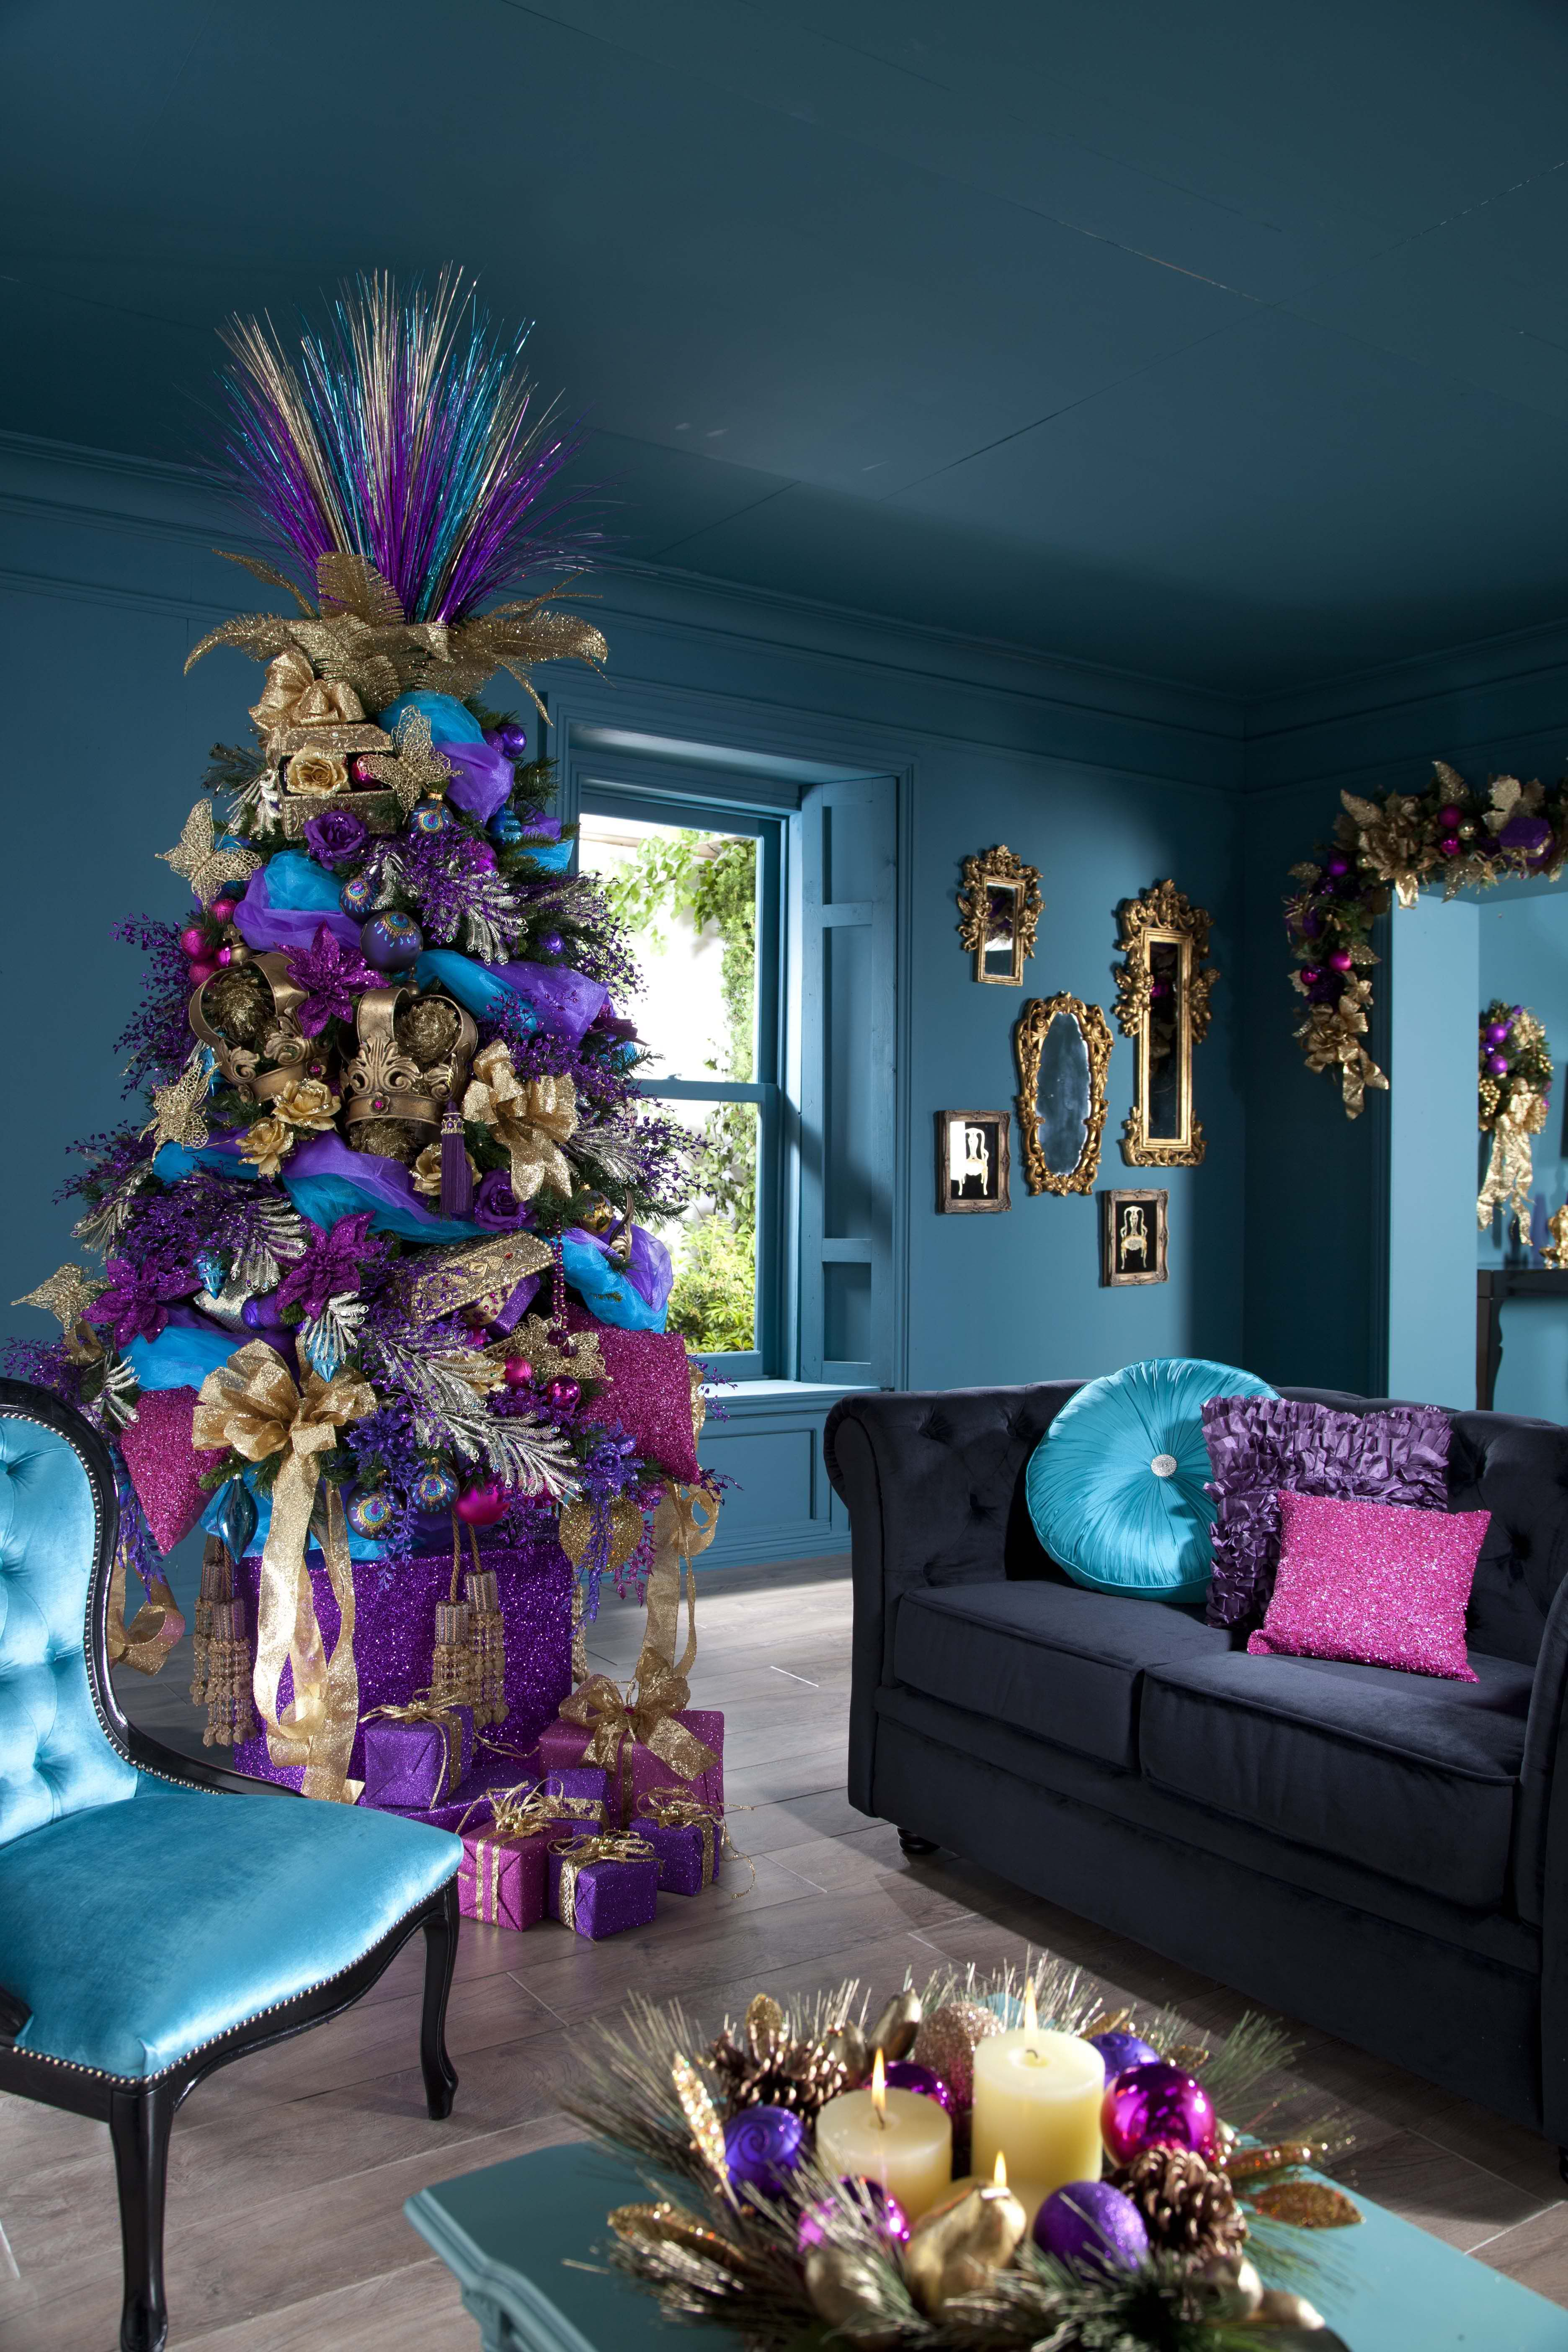 Modern Christmas Tree Decorating Ideas 37 inspiring christmas tree decorating ideas | christmas trees